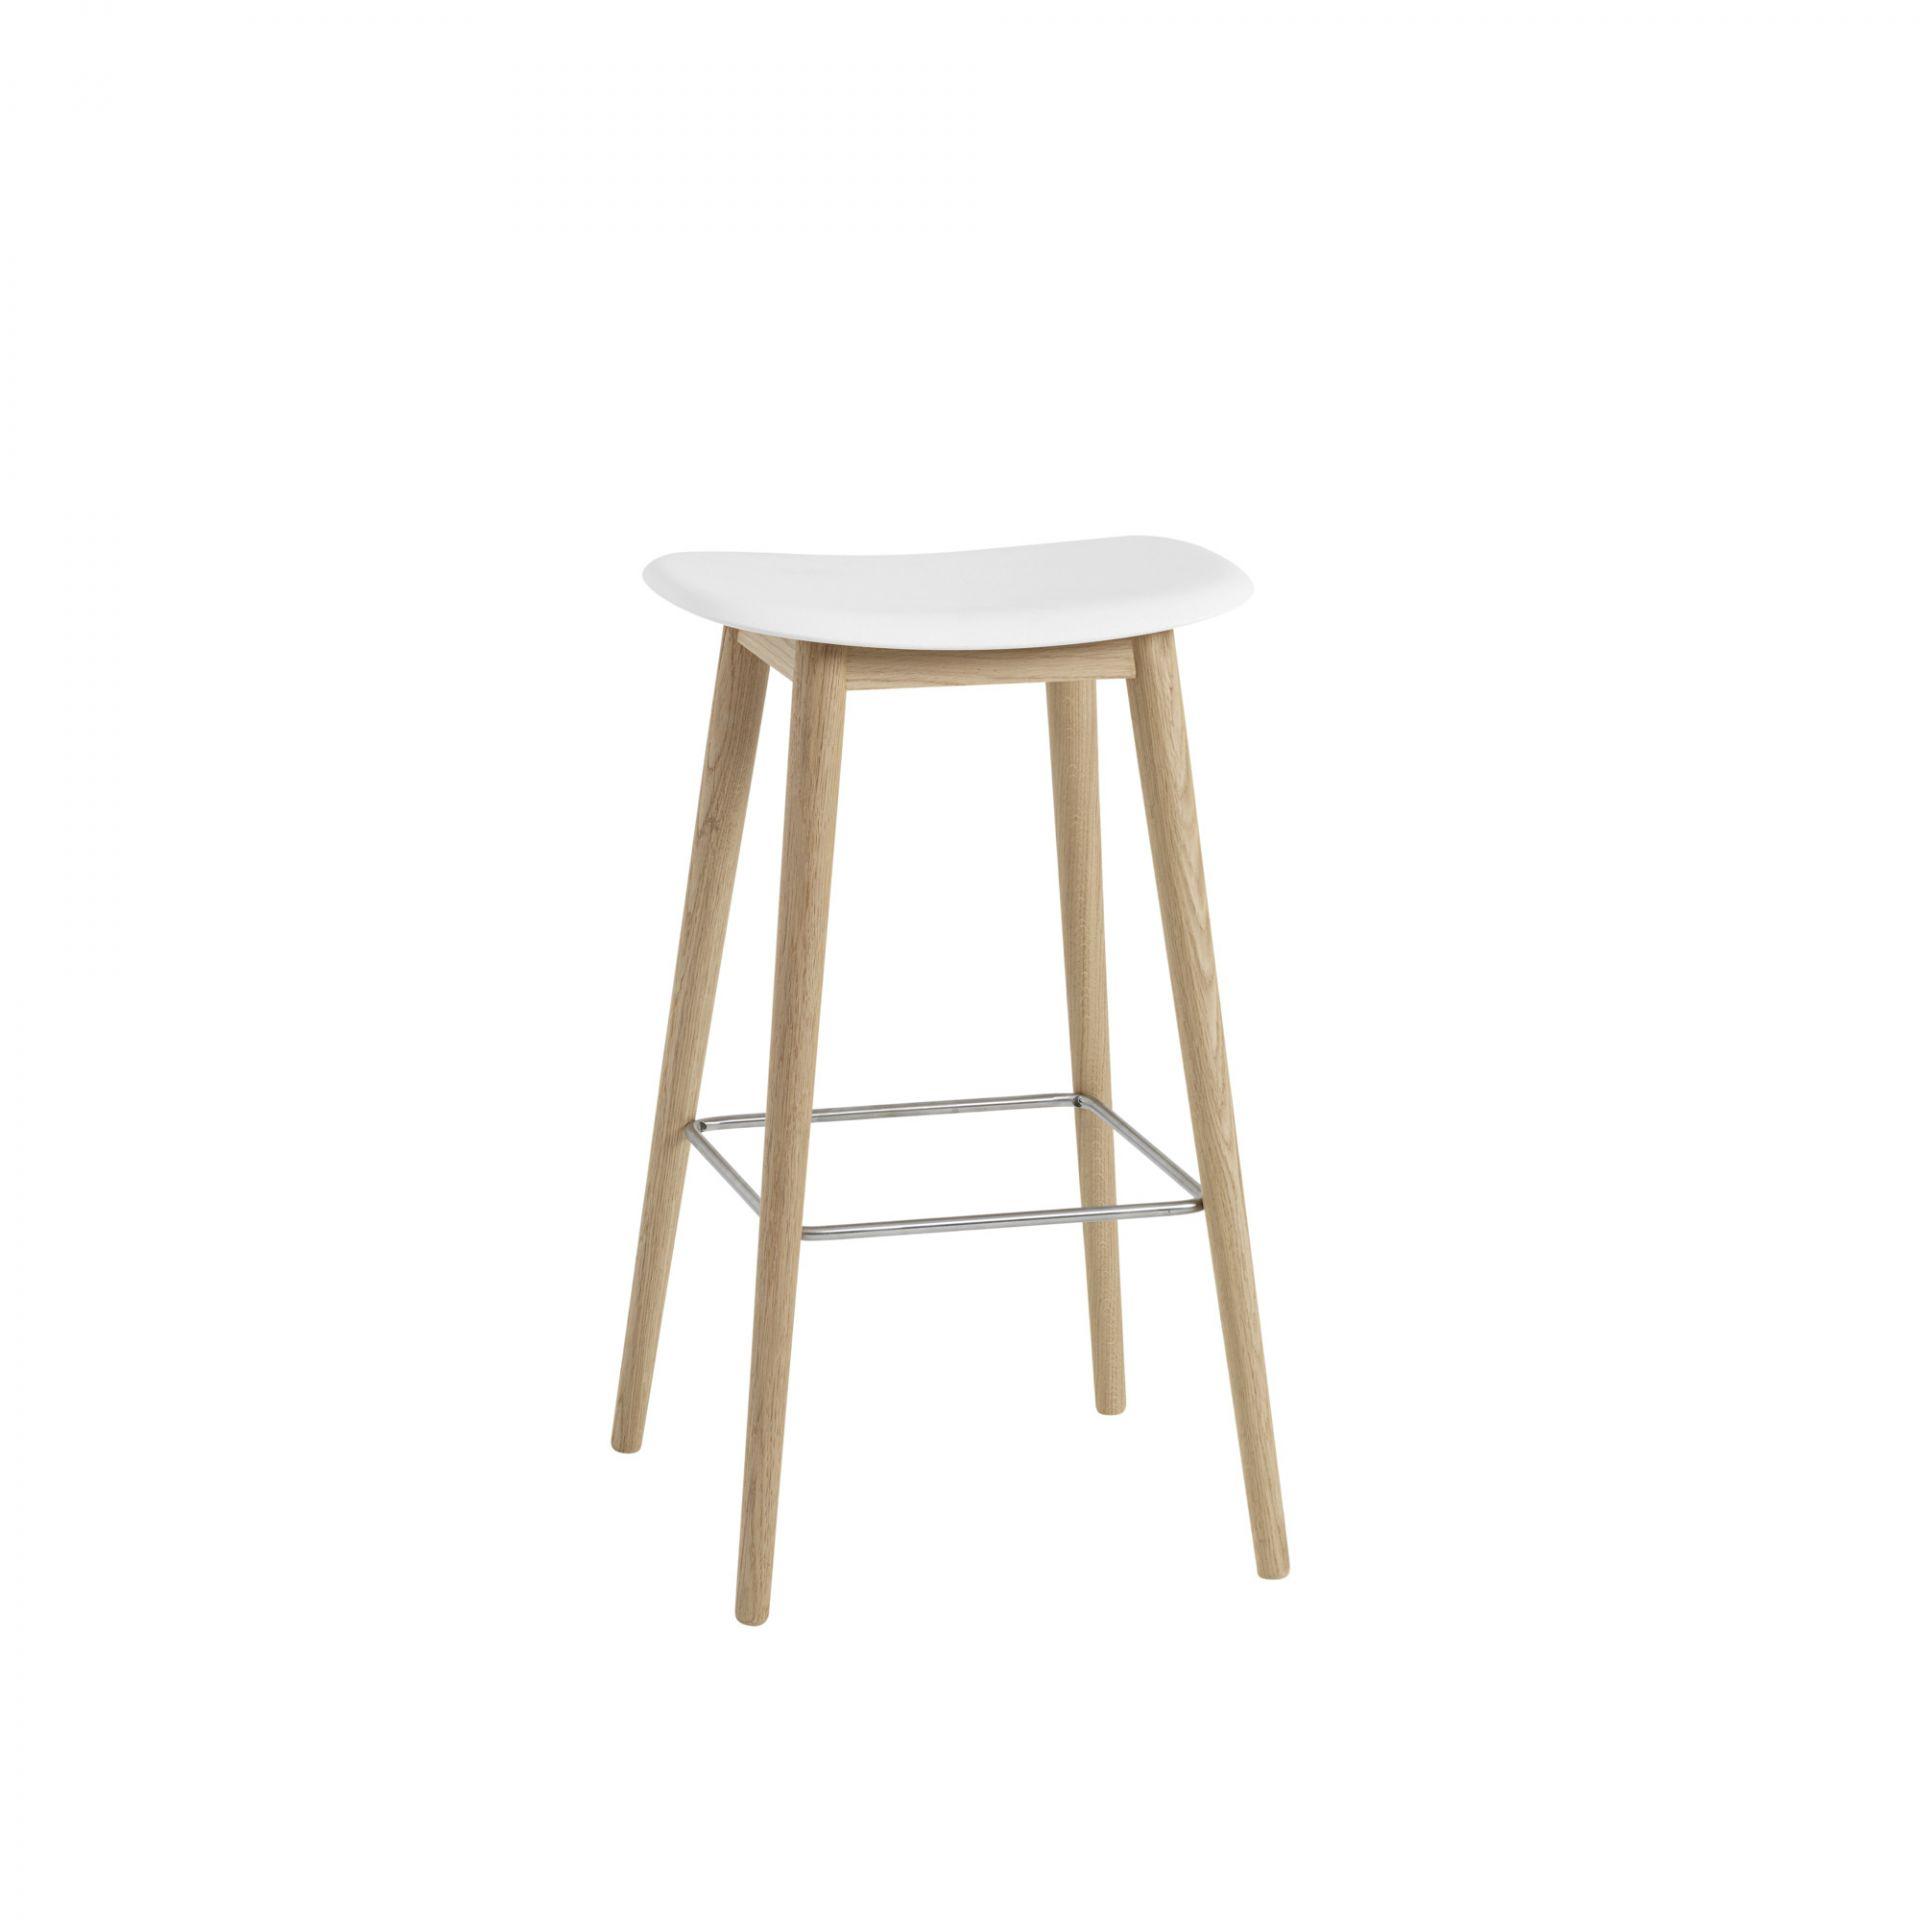 Fiber Bar Stool 75 cm wooden white / oak Muuto Nature